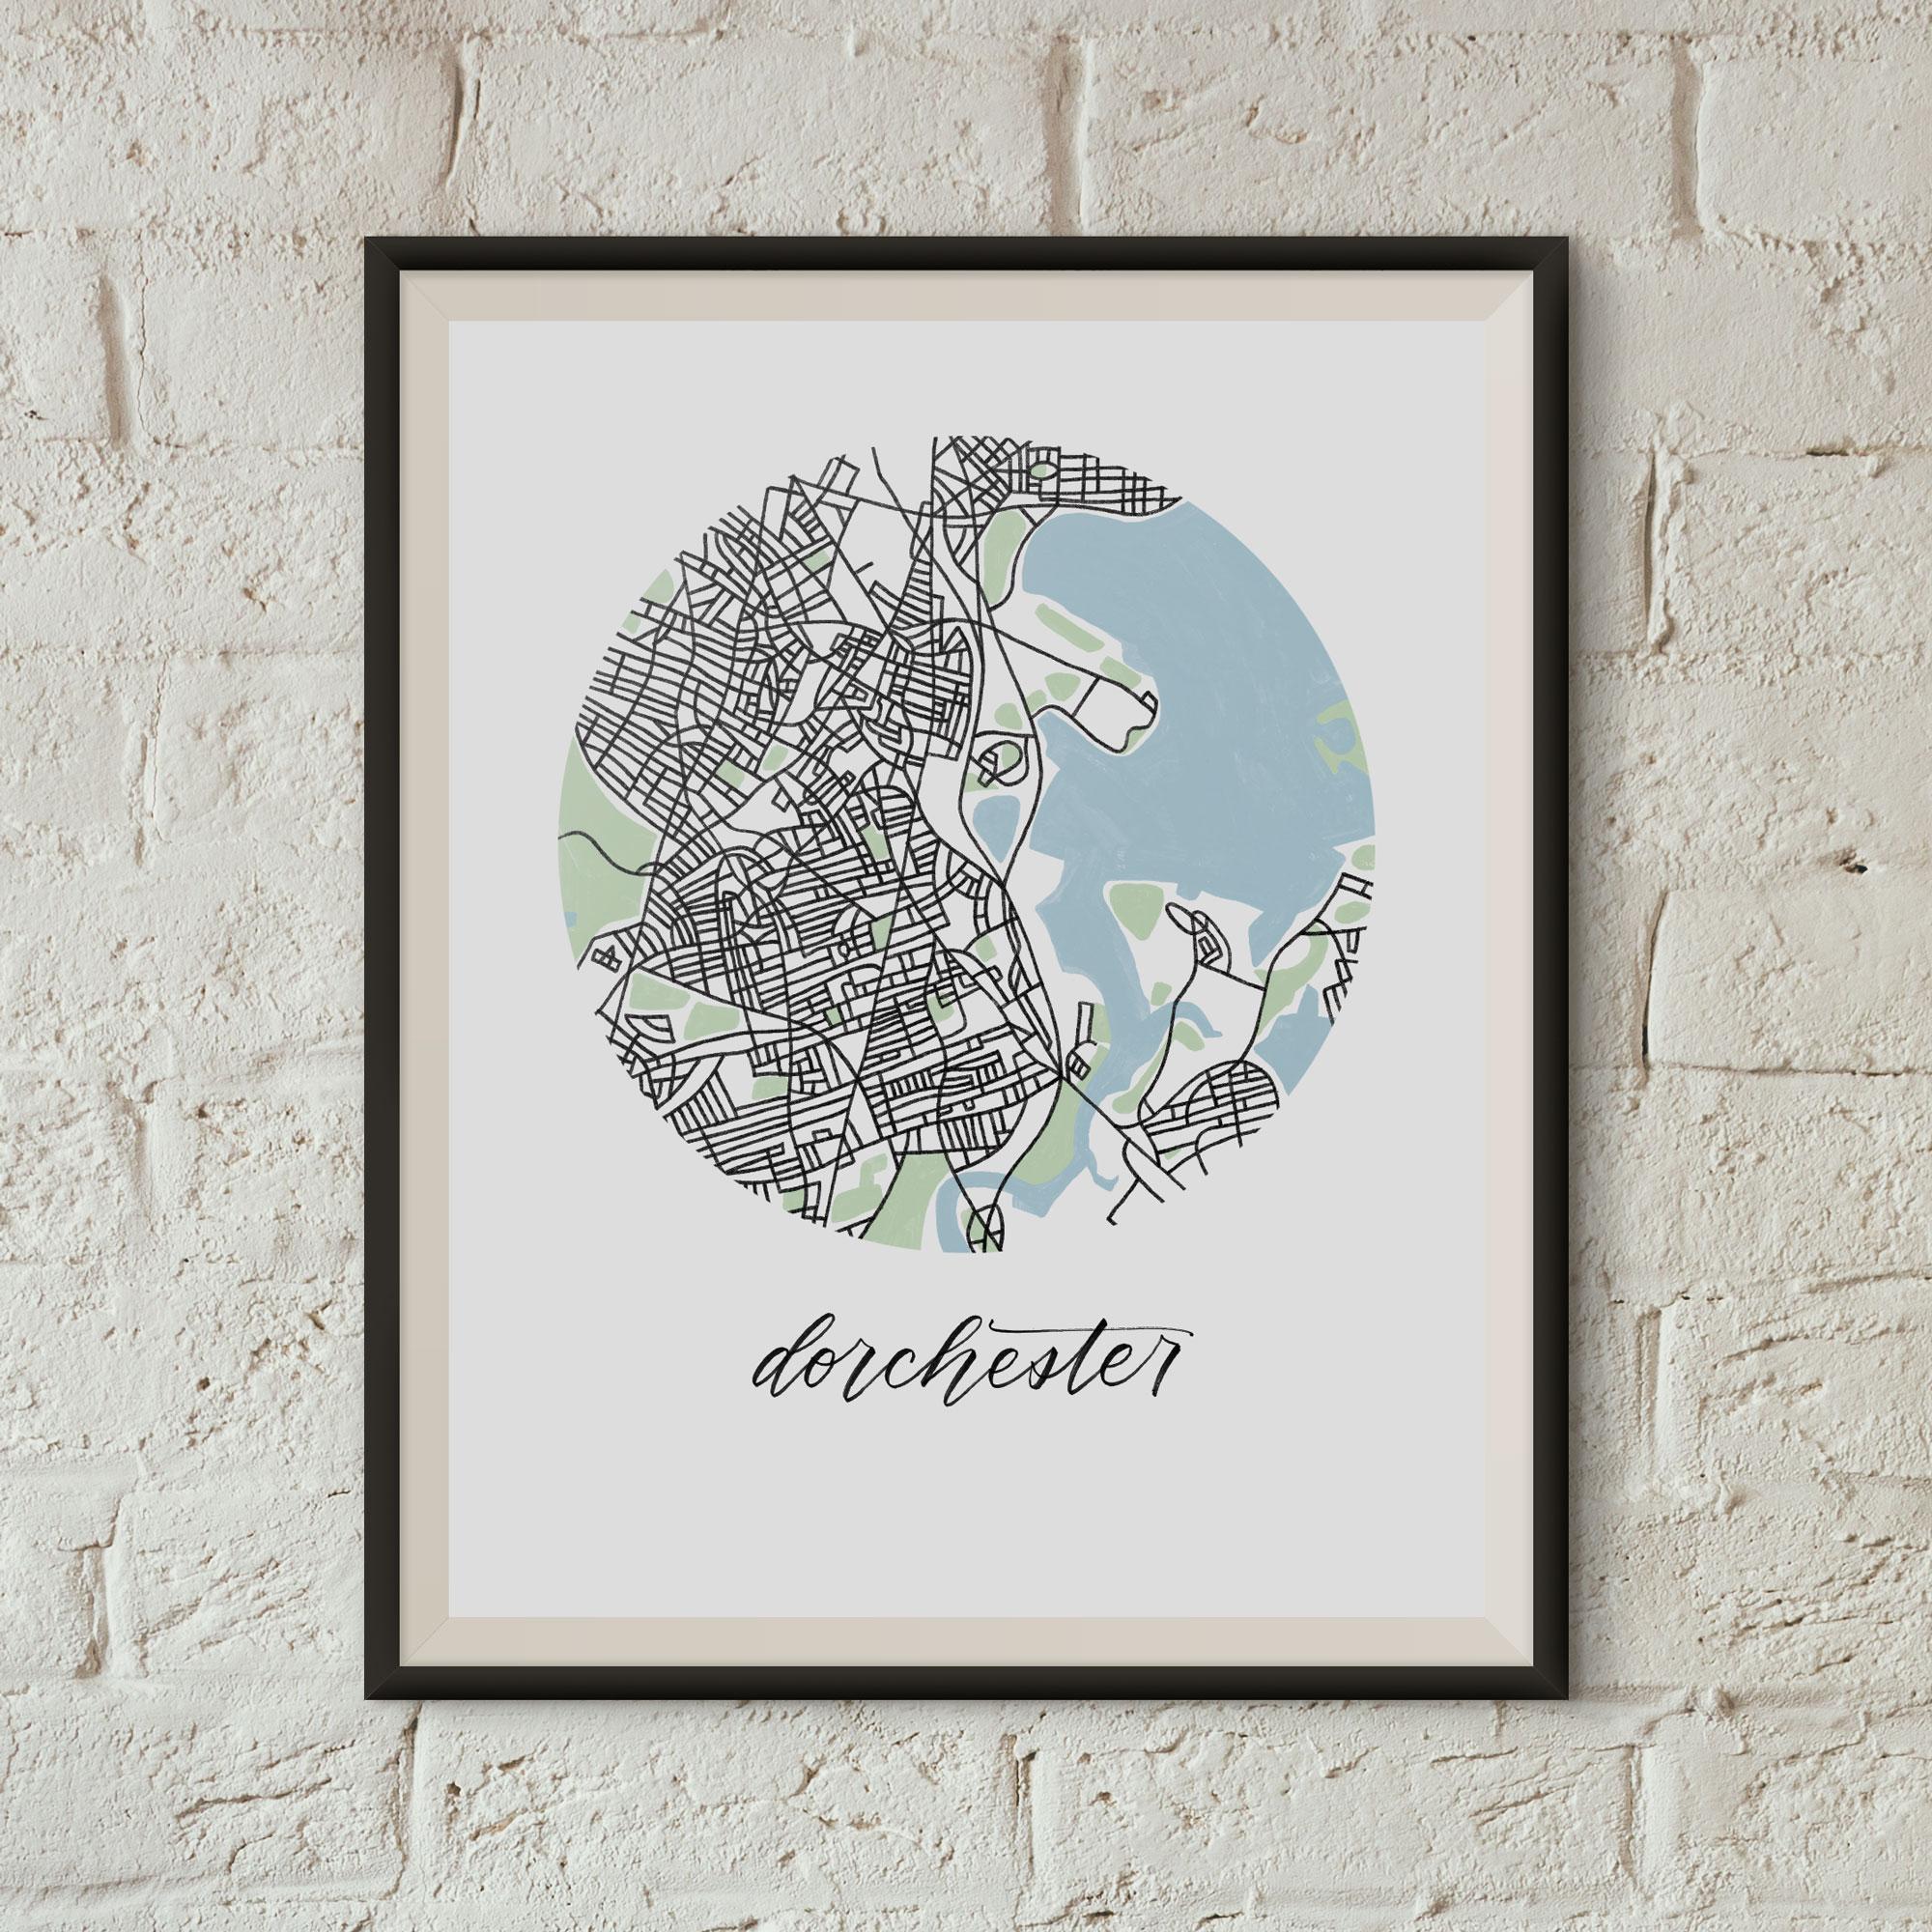 Dorchester, Boston Map Print framed on a white brick wall